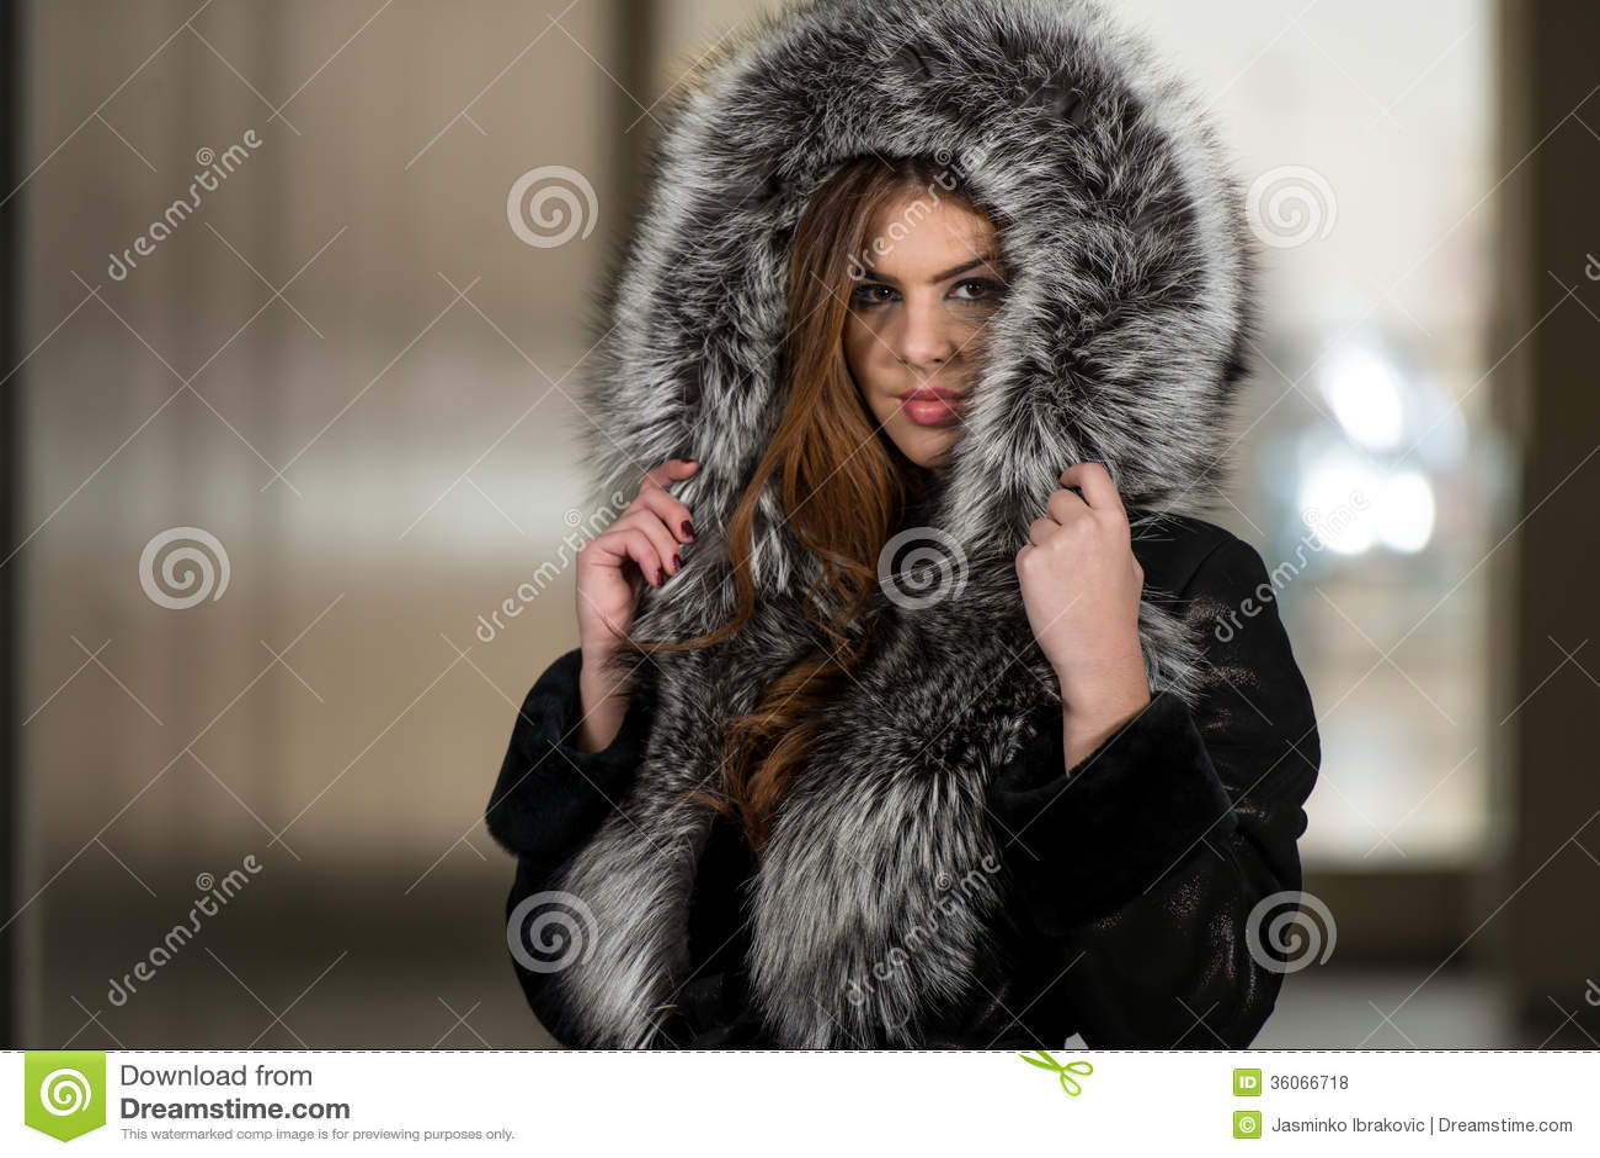 Life Of Luxury Royalty Free Stock Photos Image 36066718